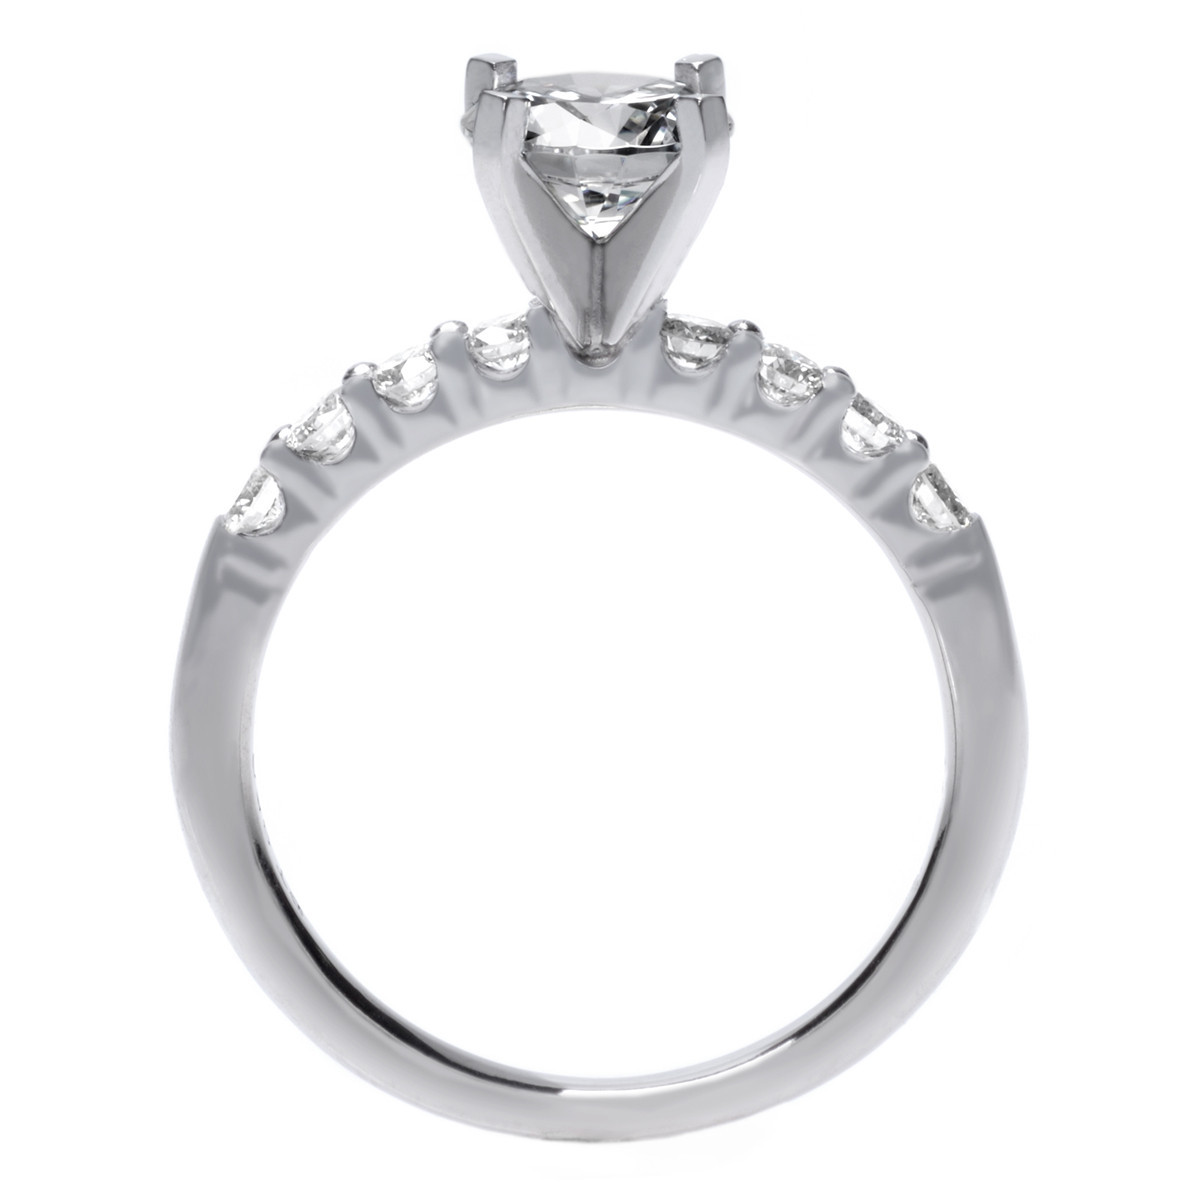 Long's Platinum Solitaire Eight Stone Diamond Engagement Ring